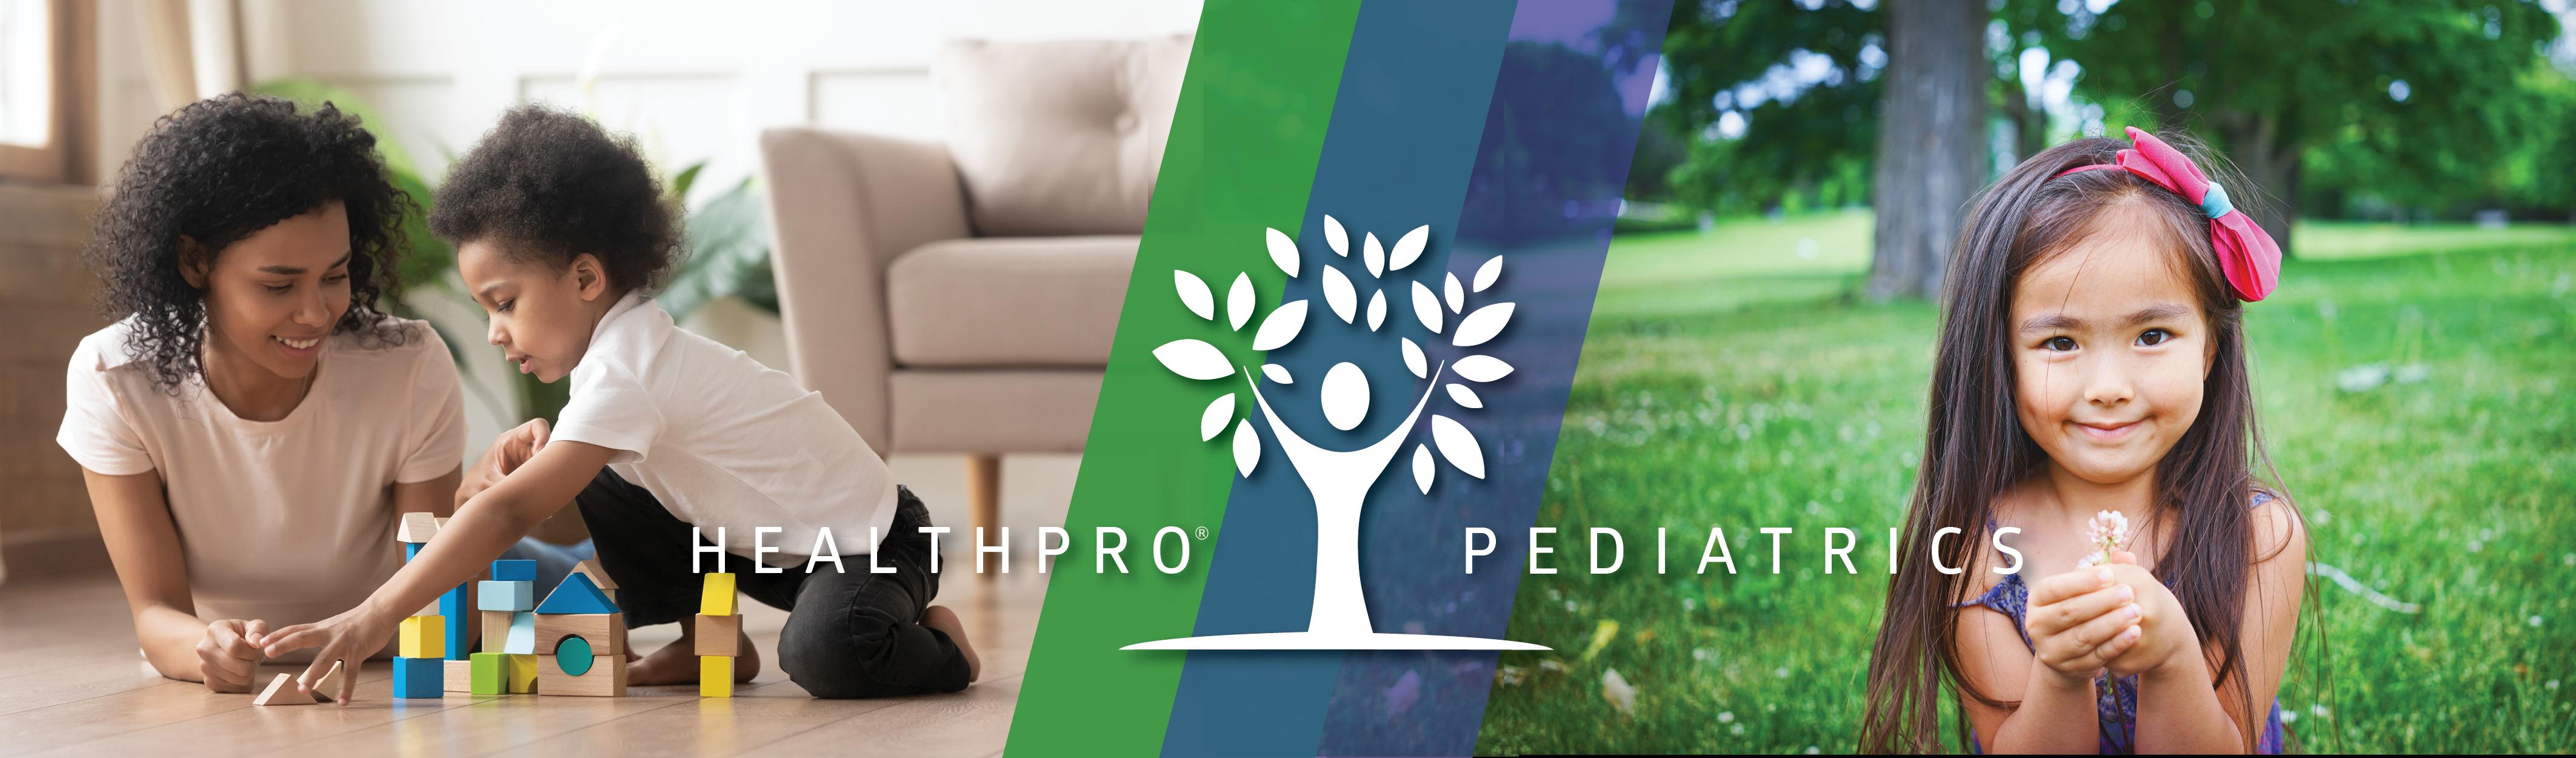 Early Intervention - HealthPRO Pediatrics